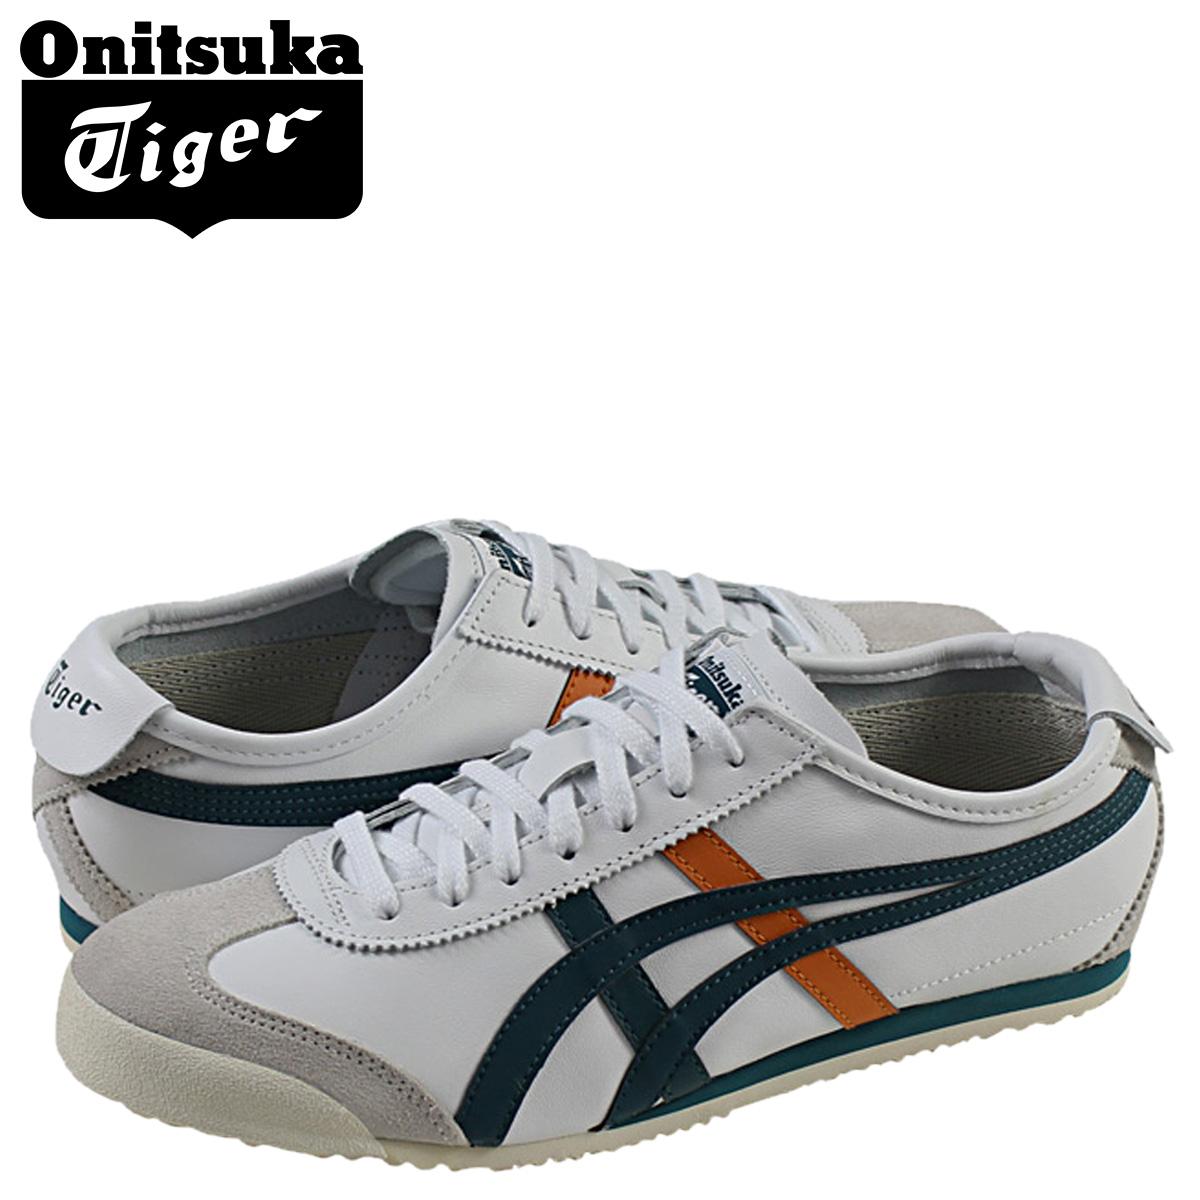 best website 2201c 6082b Onitsuka Tiger asics ONITSUKA Tiger ASICs Mexico 66 sneaker MEXICO 66 TH4J  2L-0180 men's women's shoes white